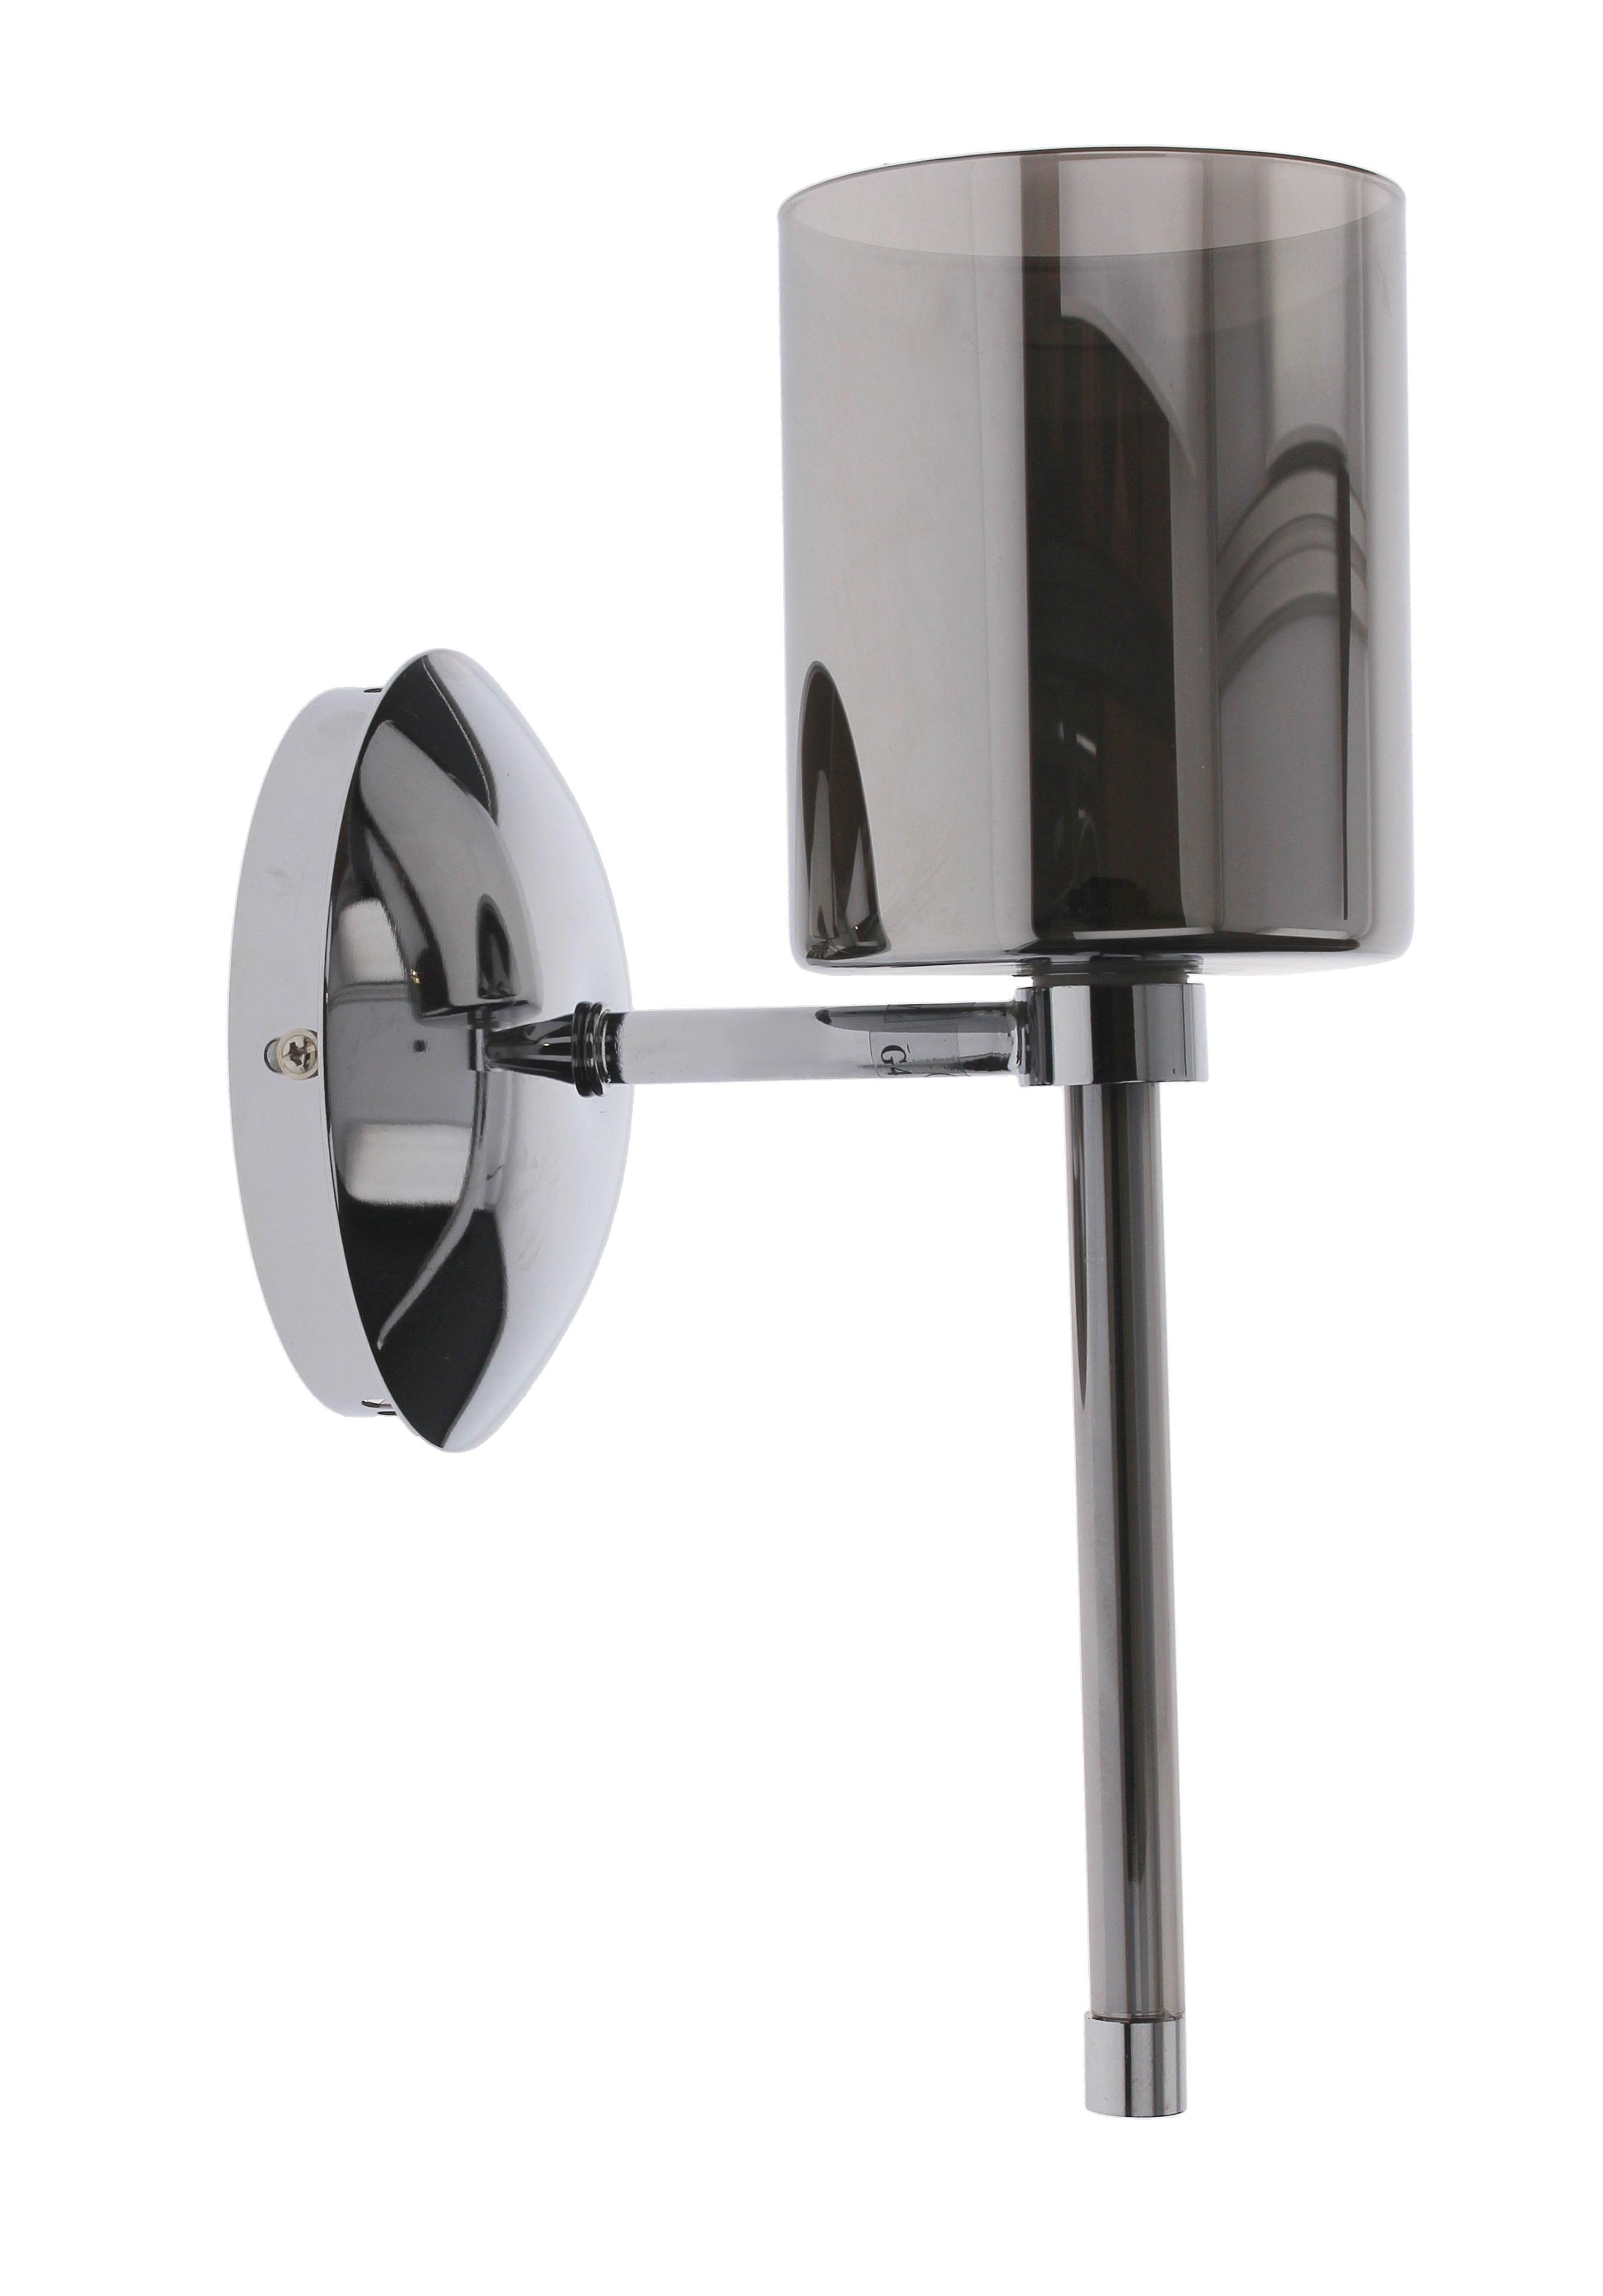 Chrome Flaconetta Wall light gray G4 20W lampshade